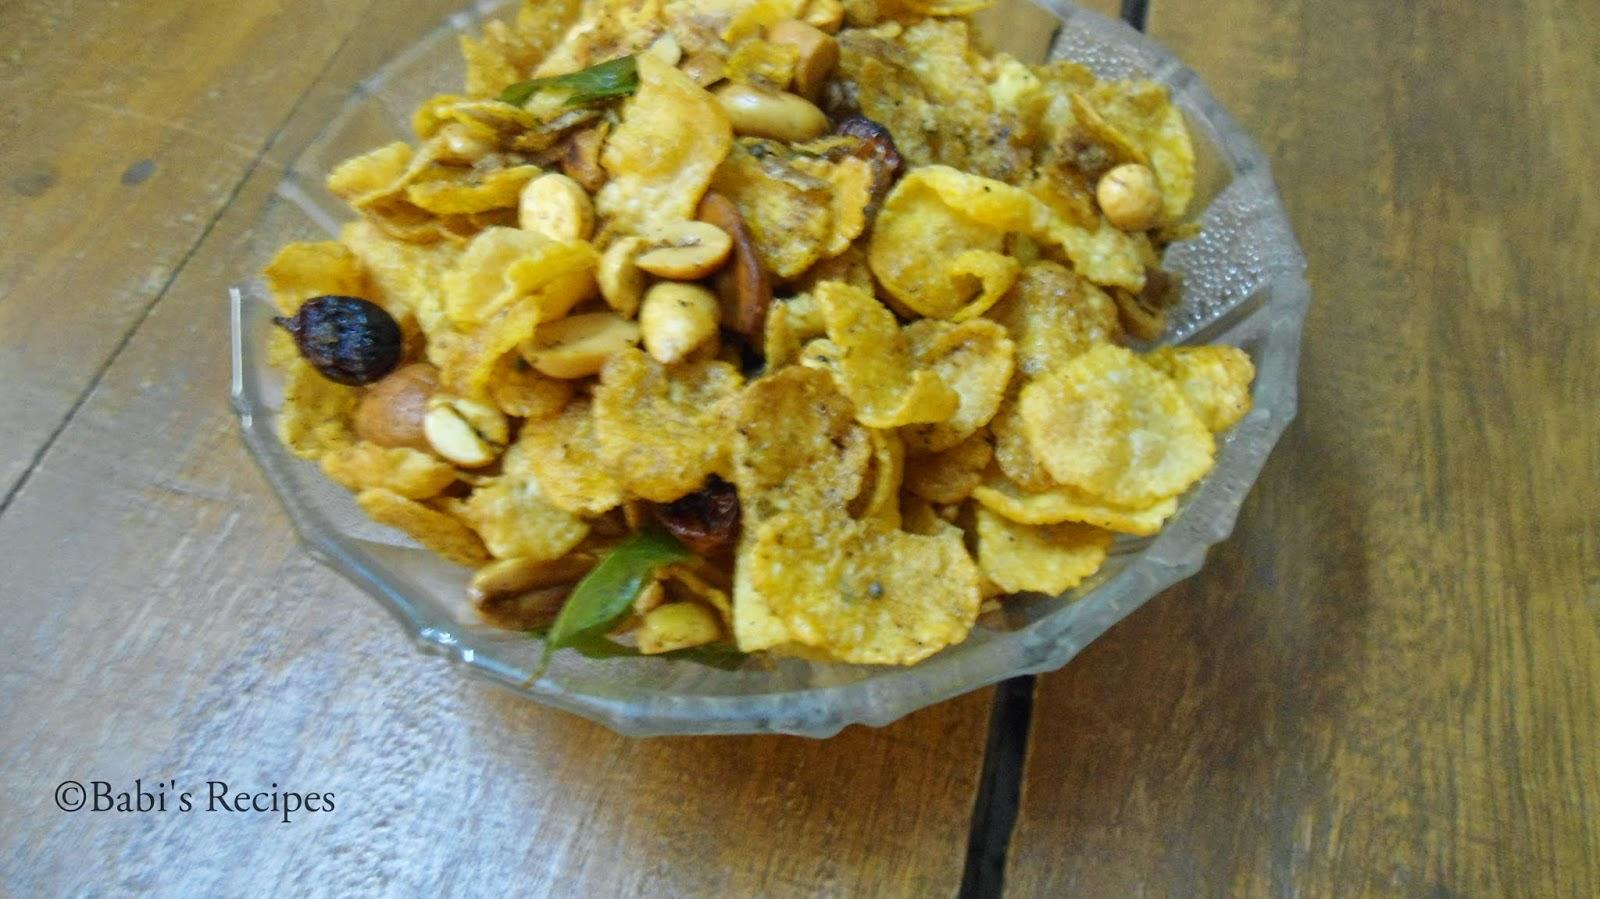 corn flakes mixture